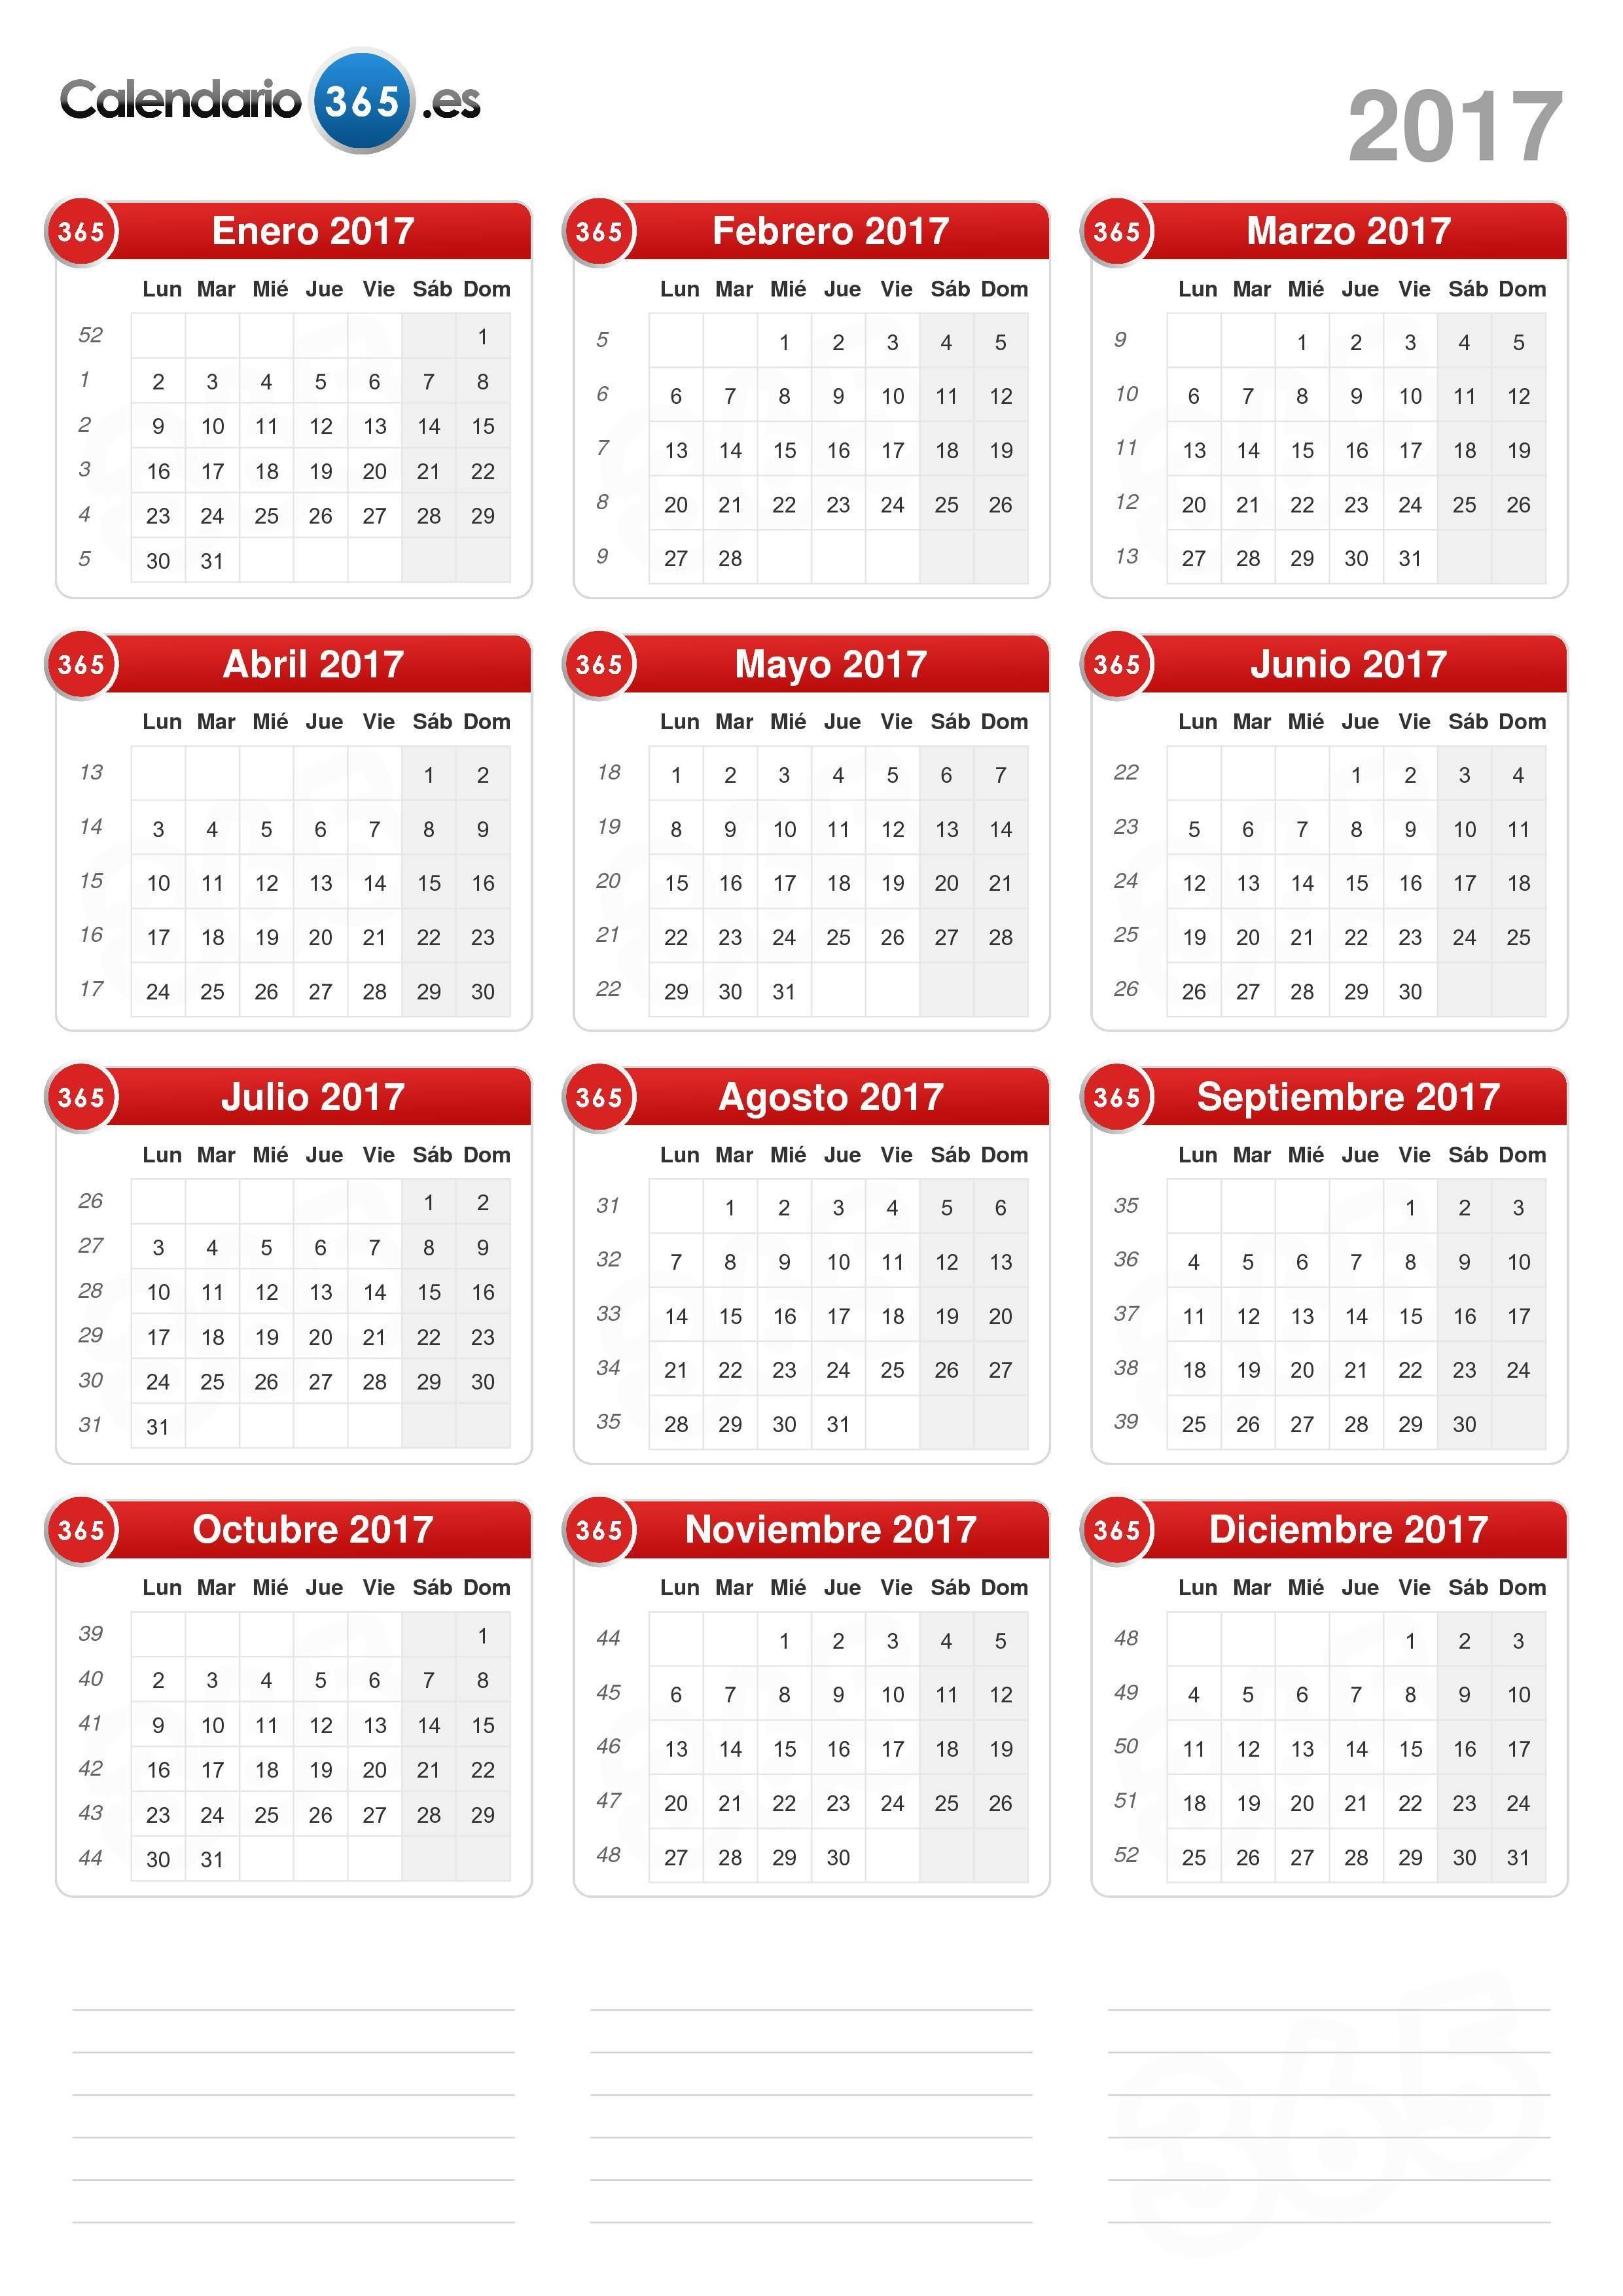 Calendario 2017 Imprimir España Más Recientes Calendario 2017 Of Calendario 2017 Imprimir España Más Recientes 254 Best Printables Images by Natalie On Pinterest